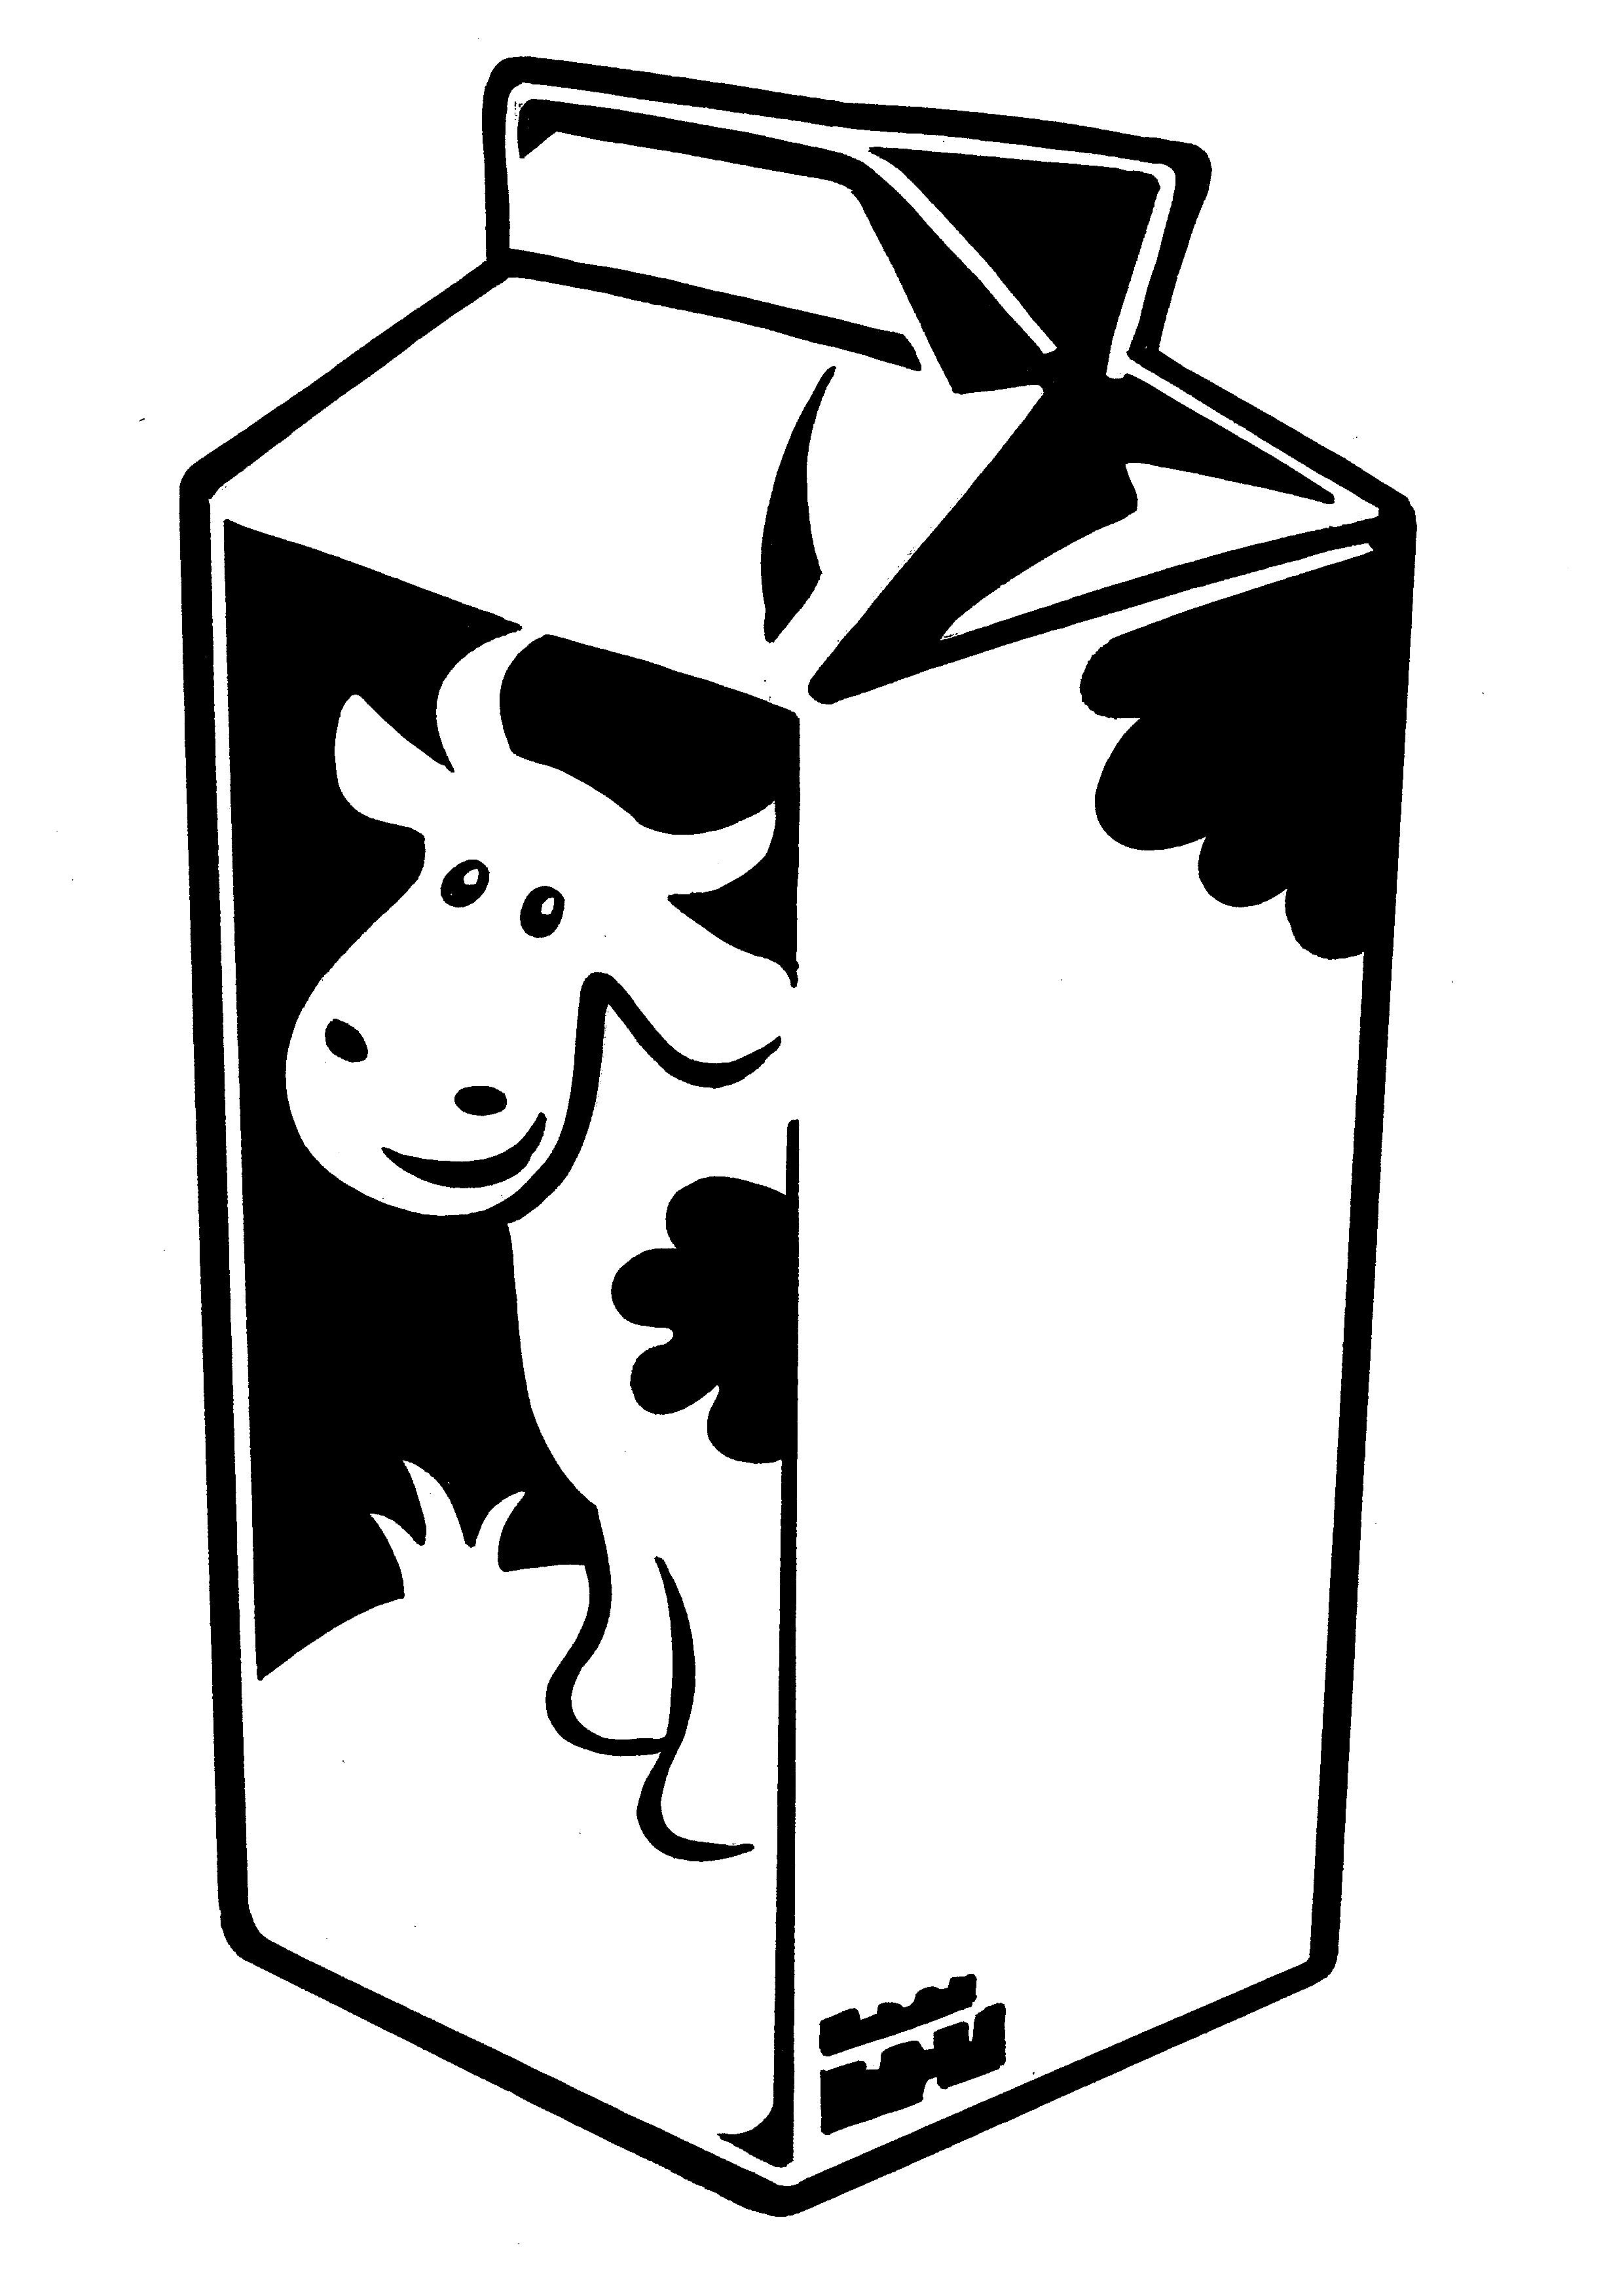 Dairy clipart animated. Milk carton clip art